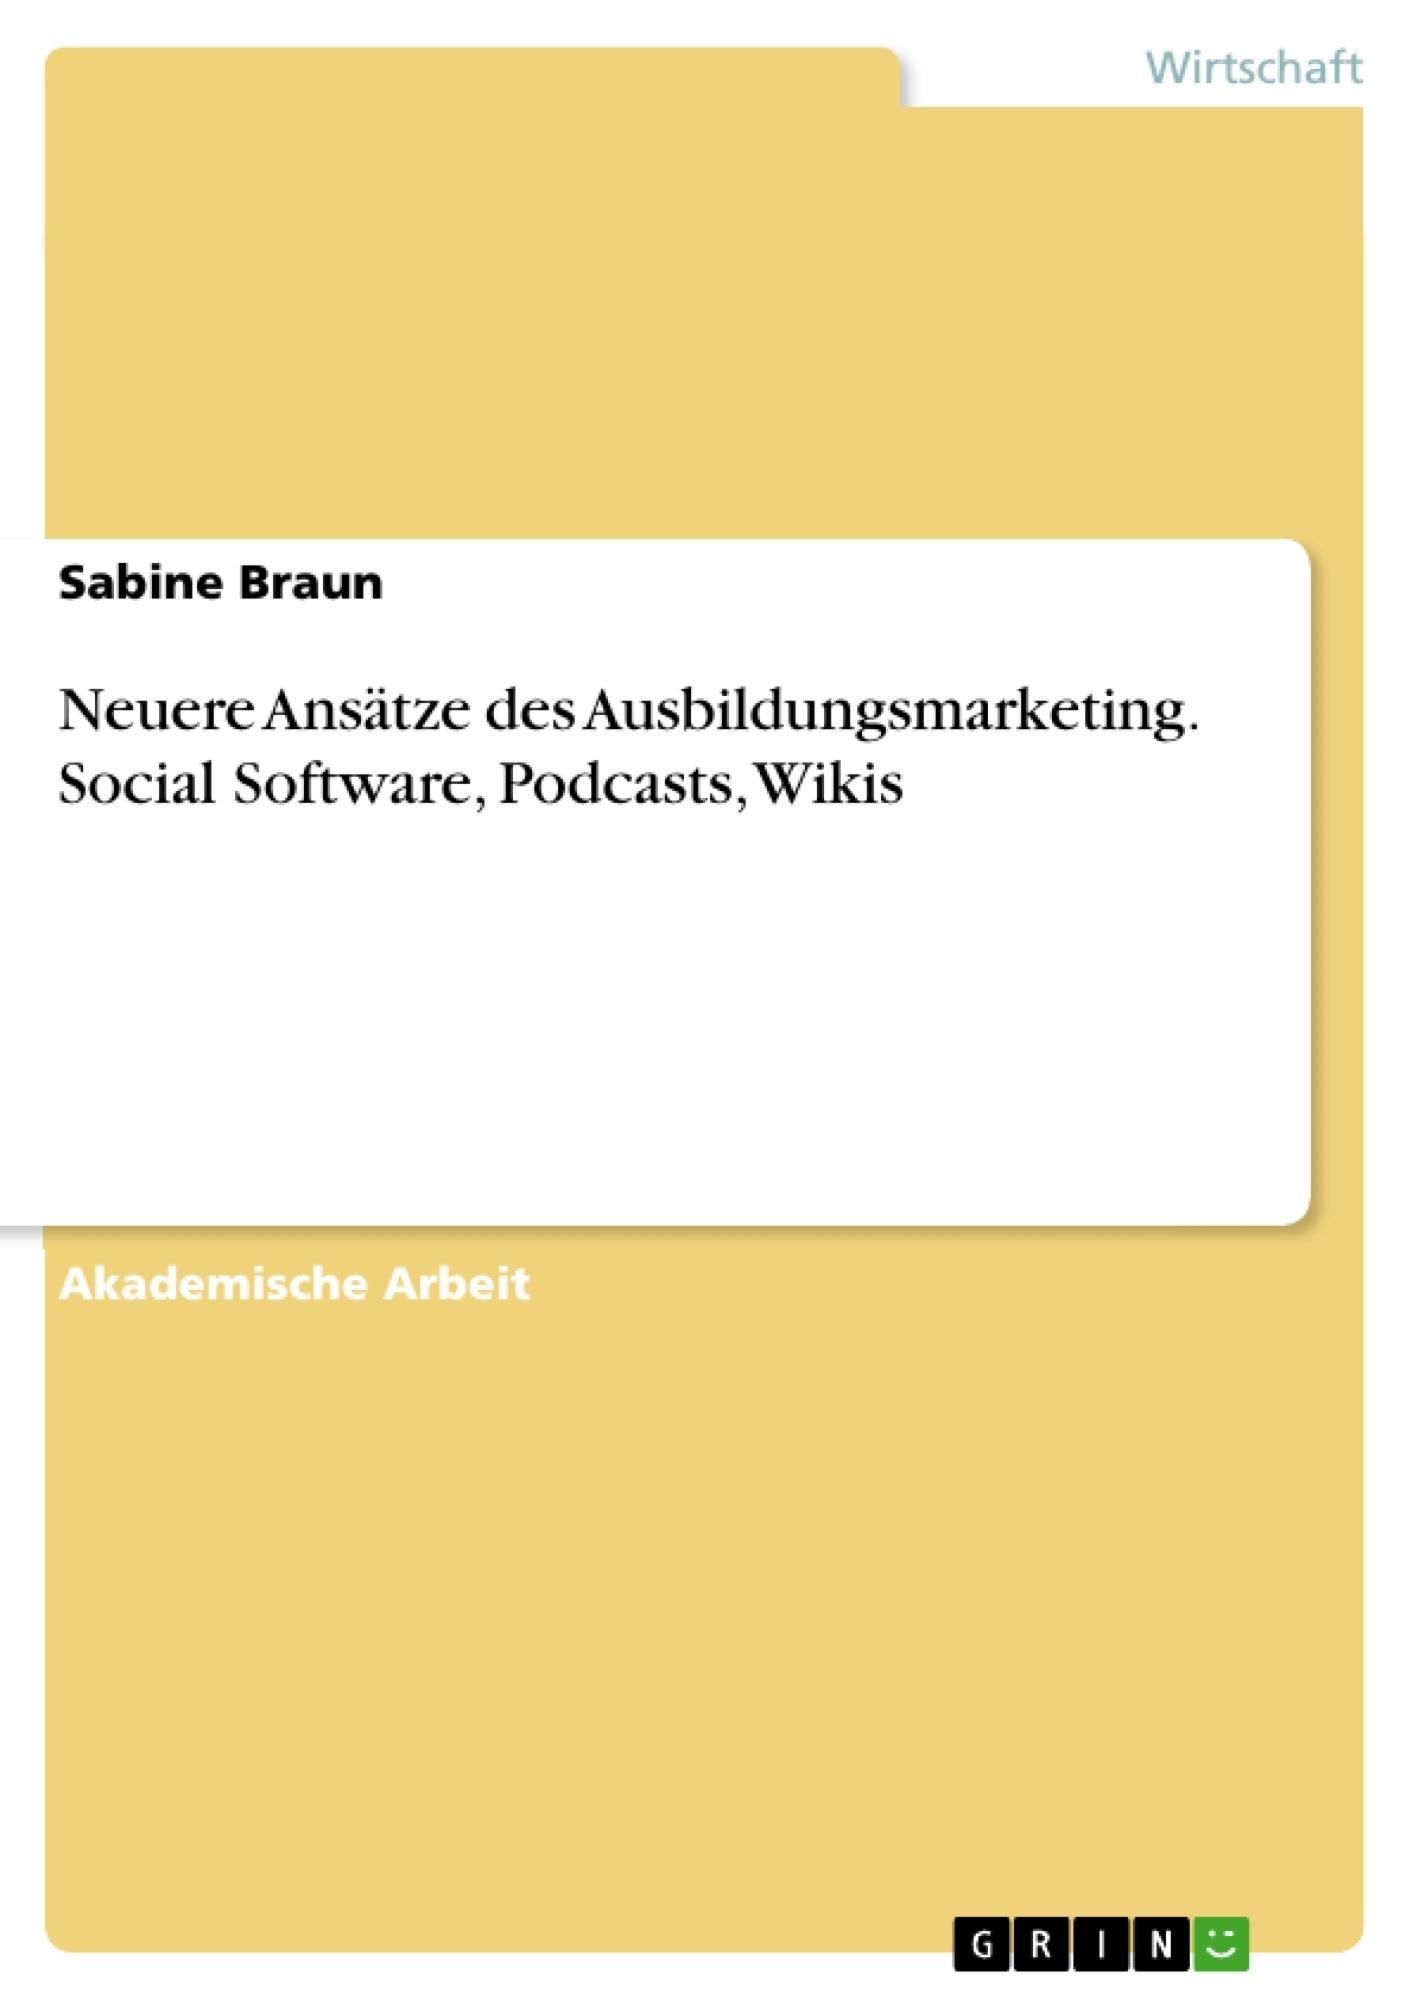 Titel: Neuere Ansätze des Ausbildungsmarketing. Social Software, Podcasts, Wikis